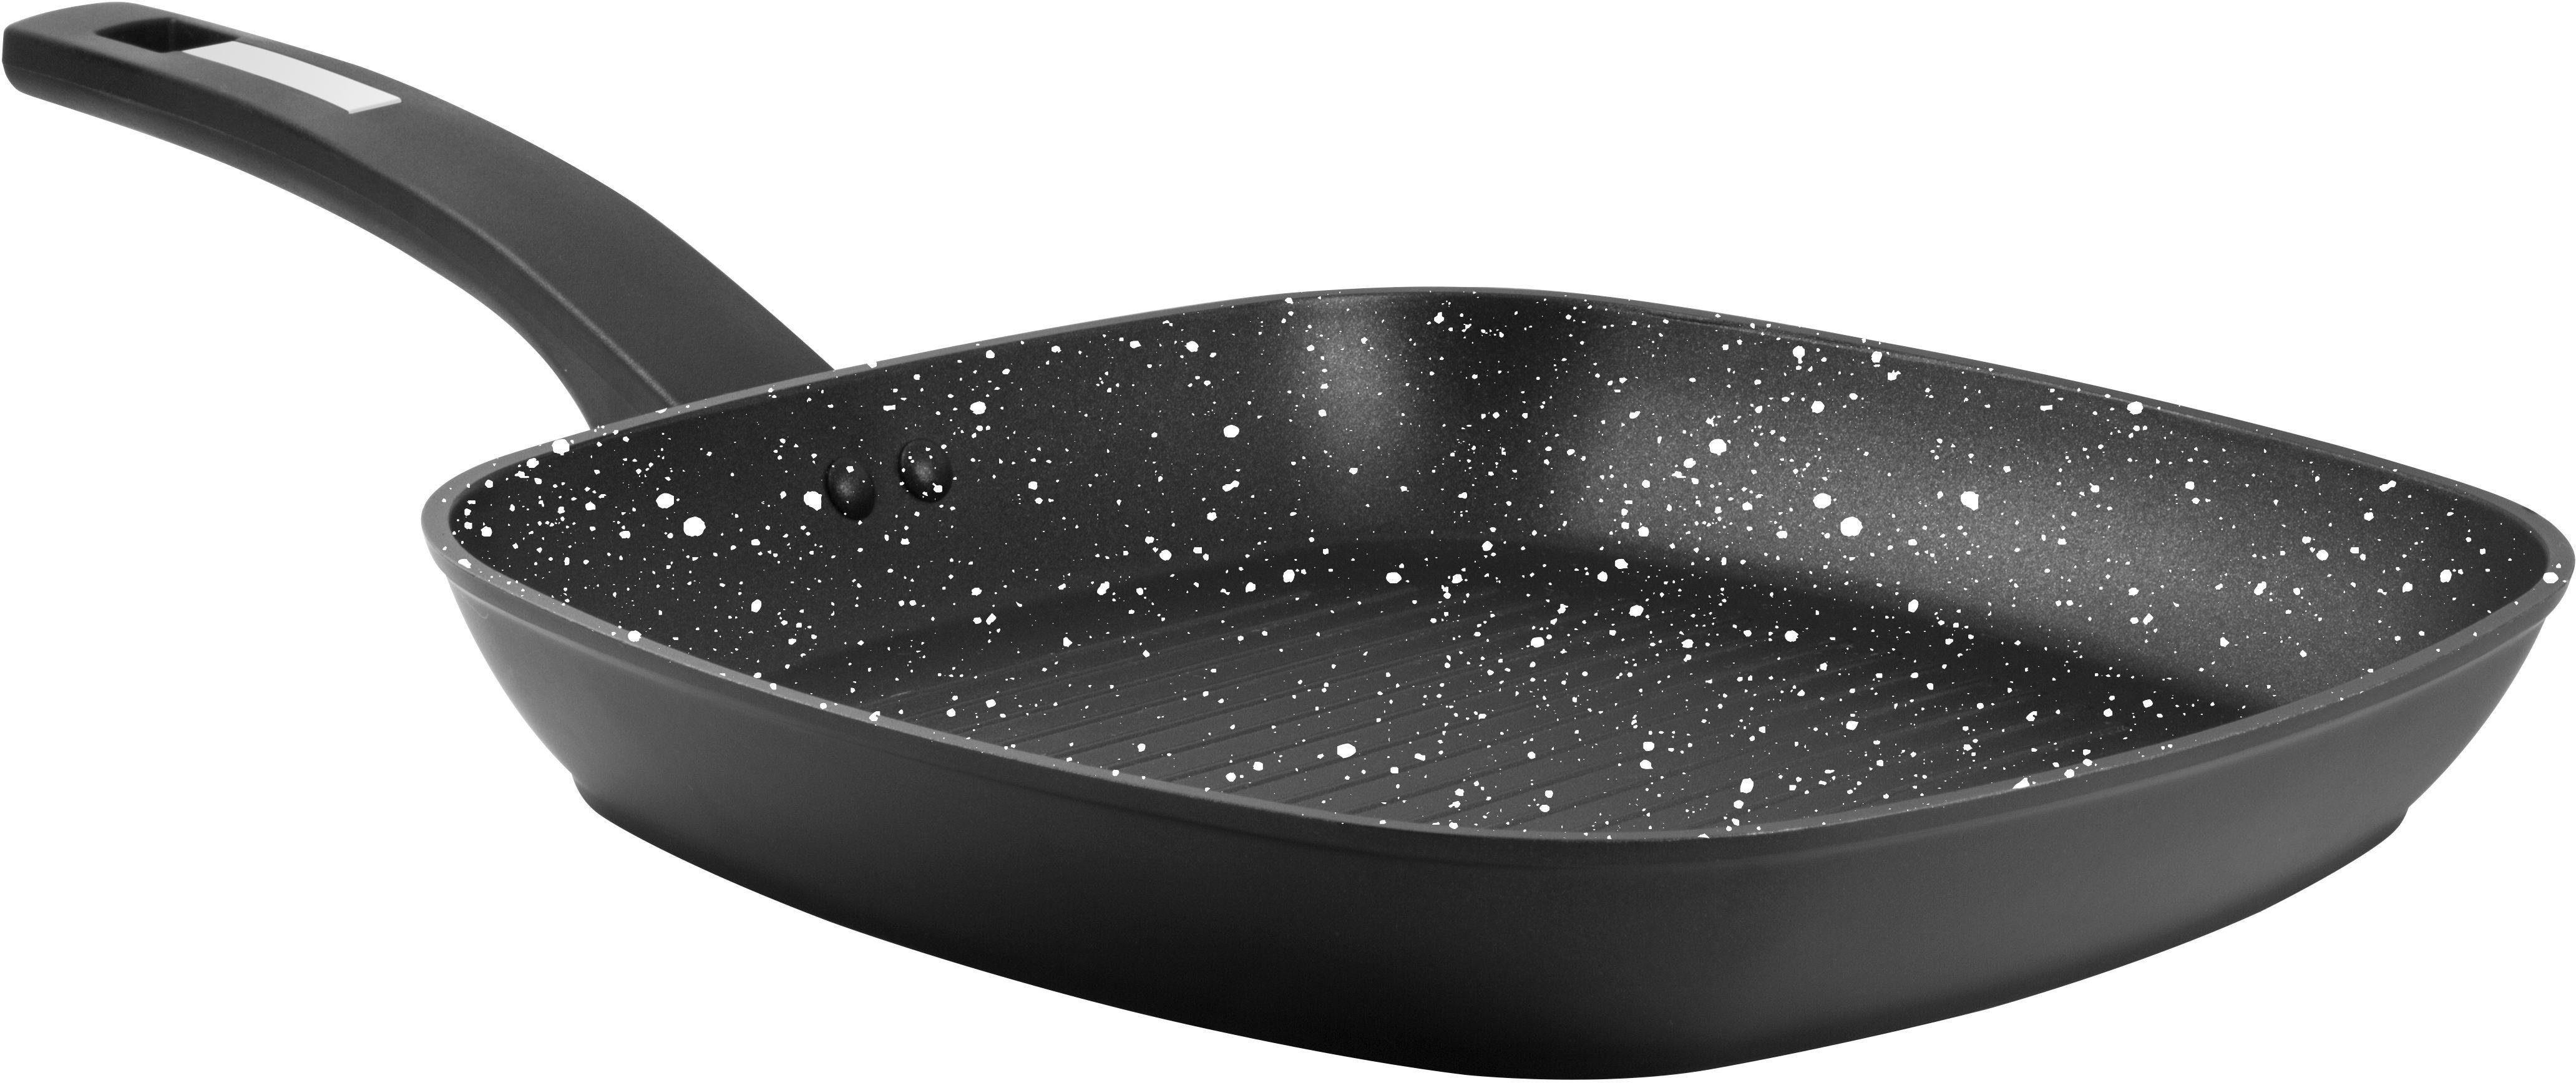 CS Kochsysteme by Carl Schmidt Sohn Steakpfanne, Ø 28 x 28 cm, Aluminium, Induktion, »Marburg«